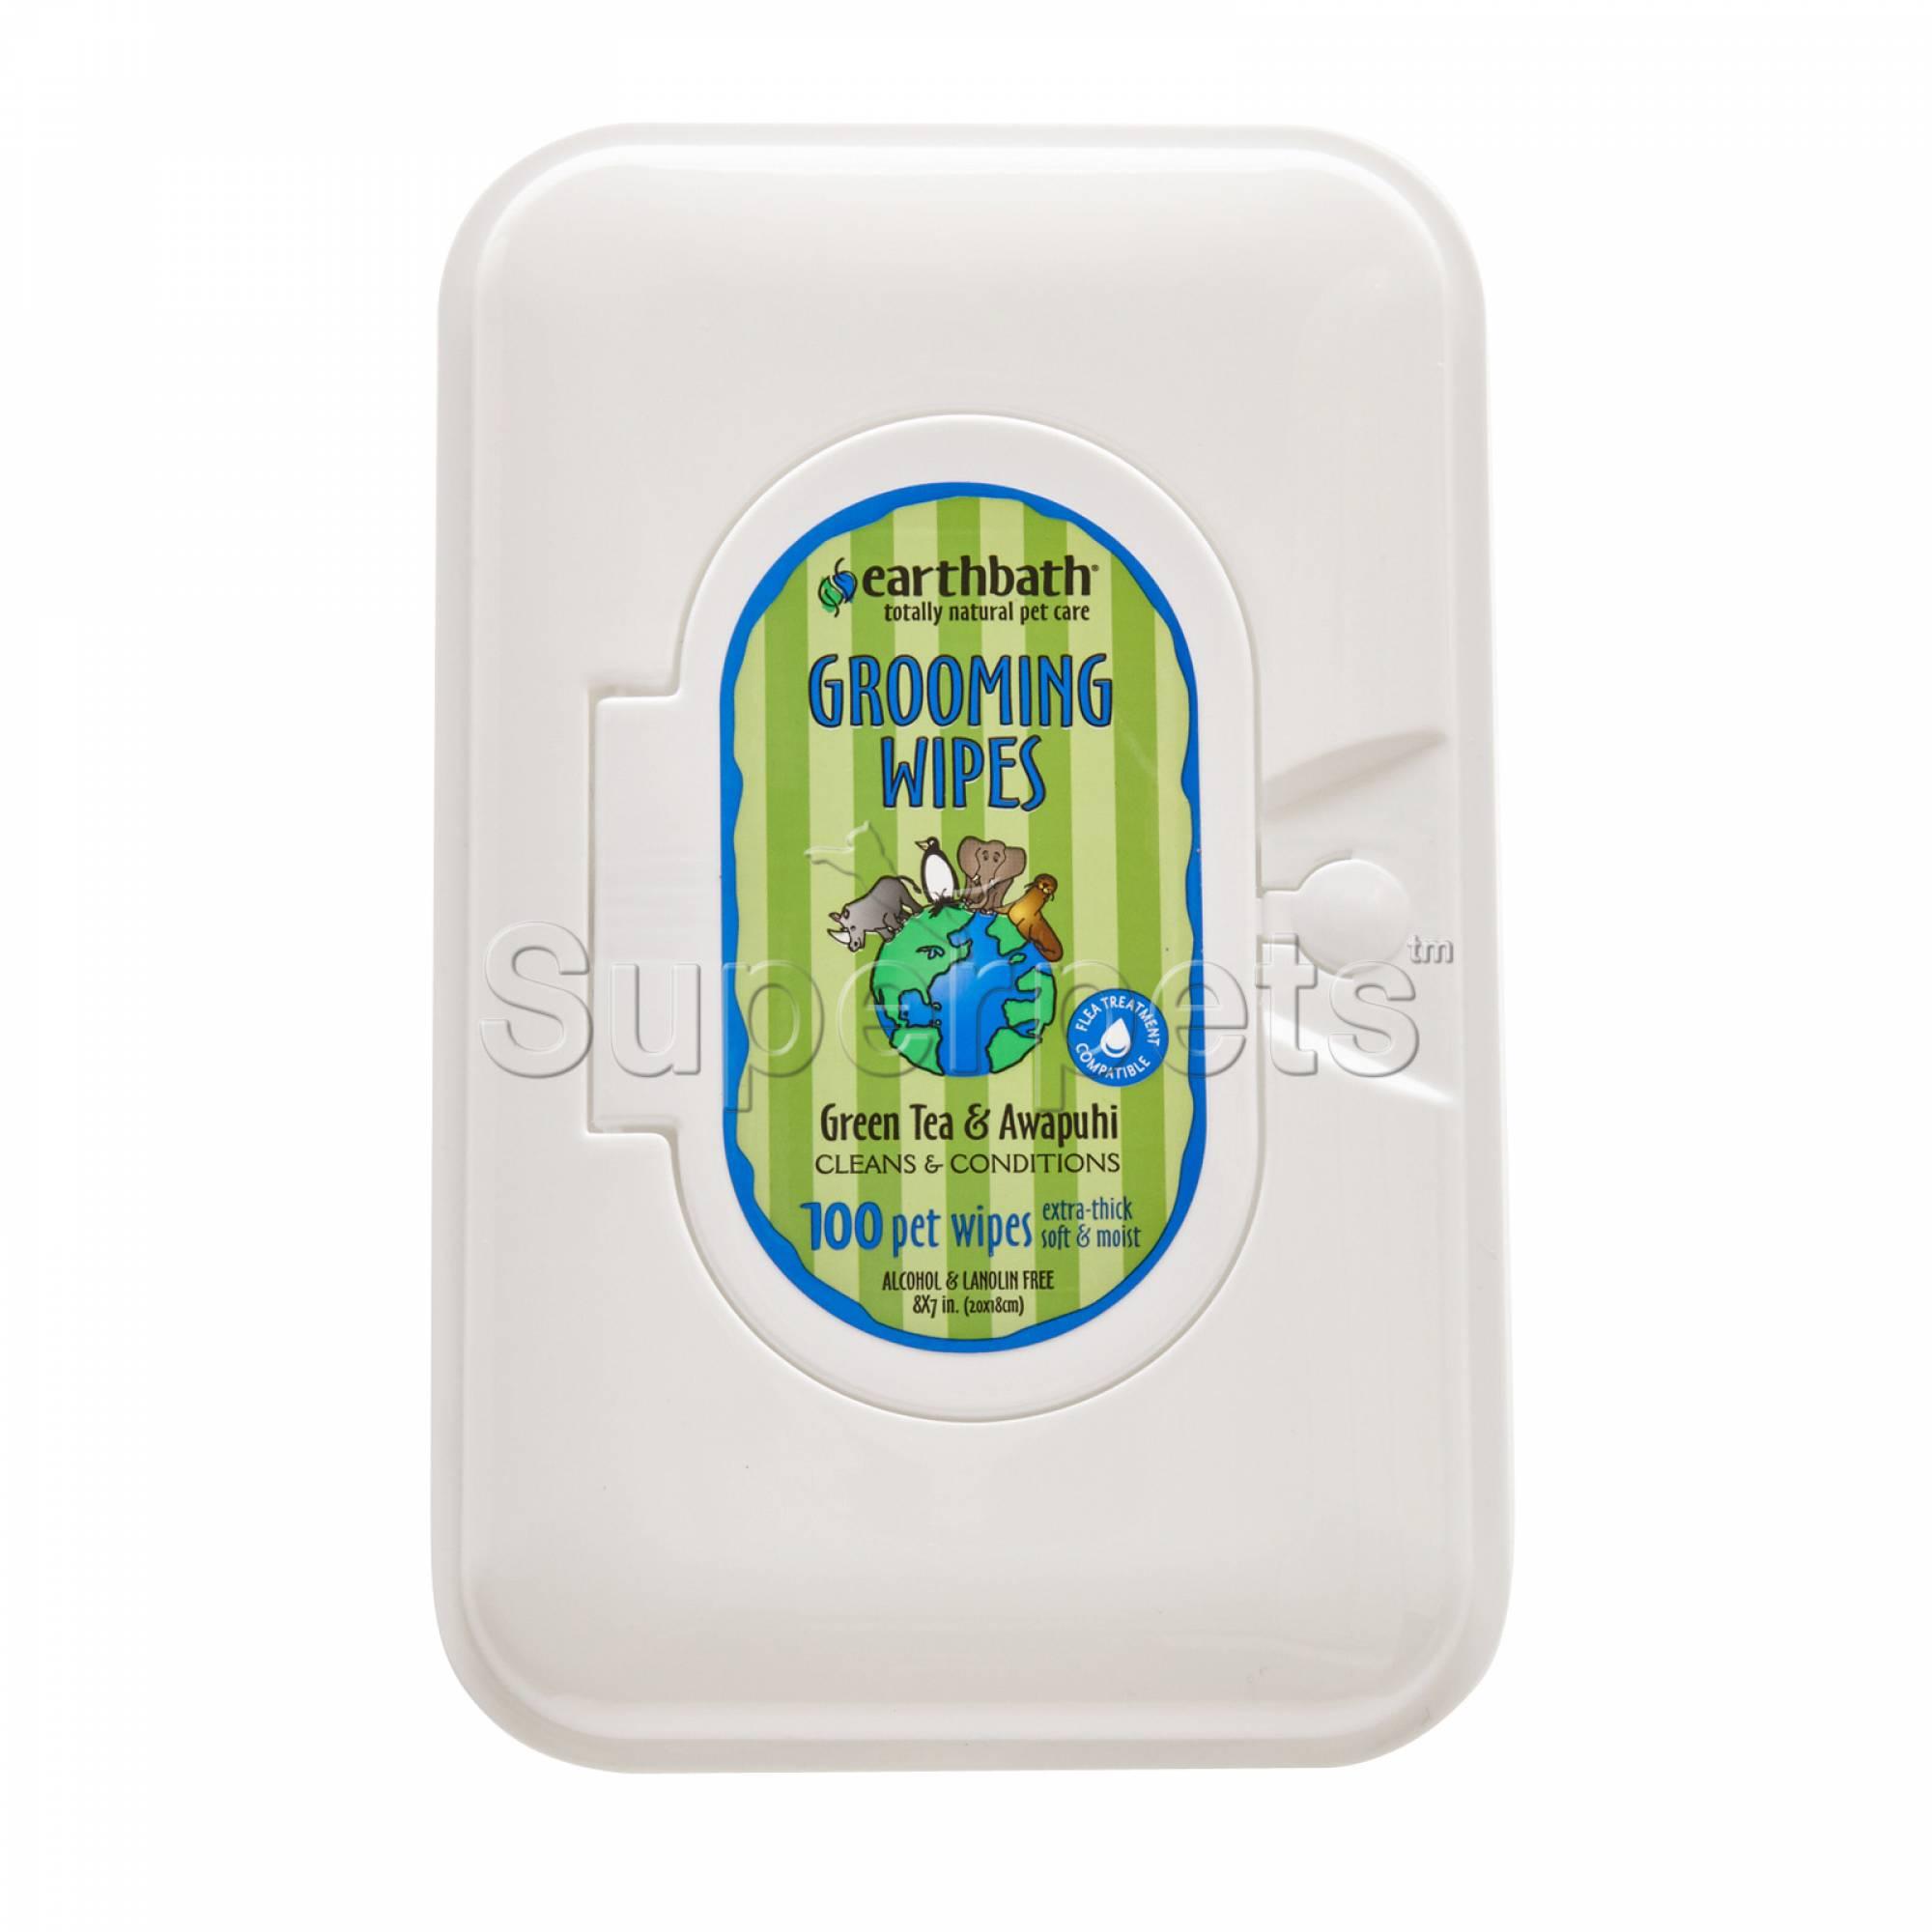 Earthbath EB031 Grooming Wipes - Green Tea & Awapuhi x100pcs